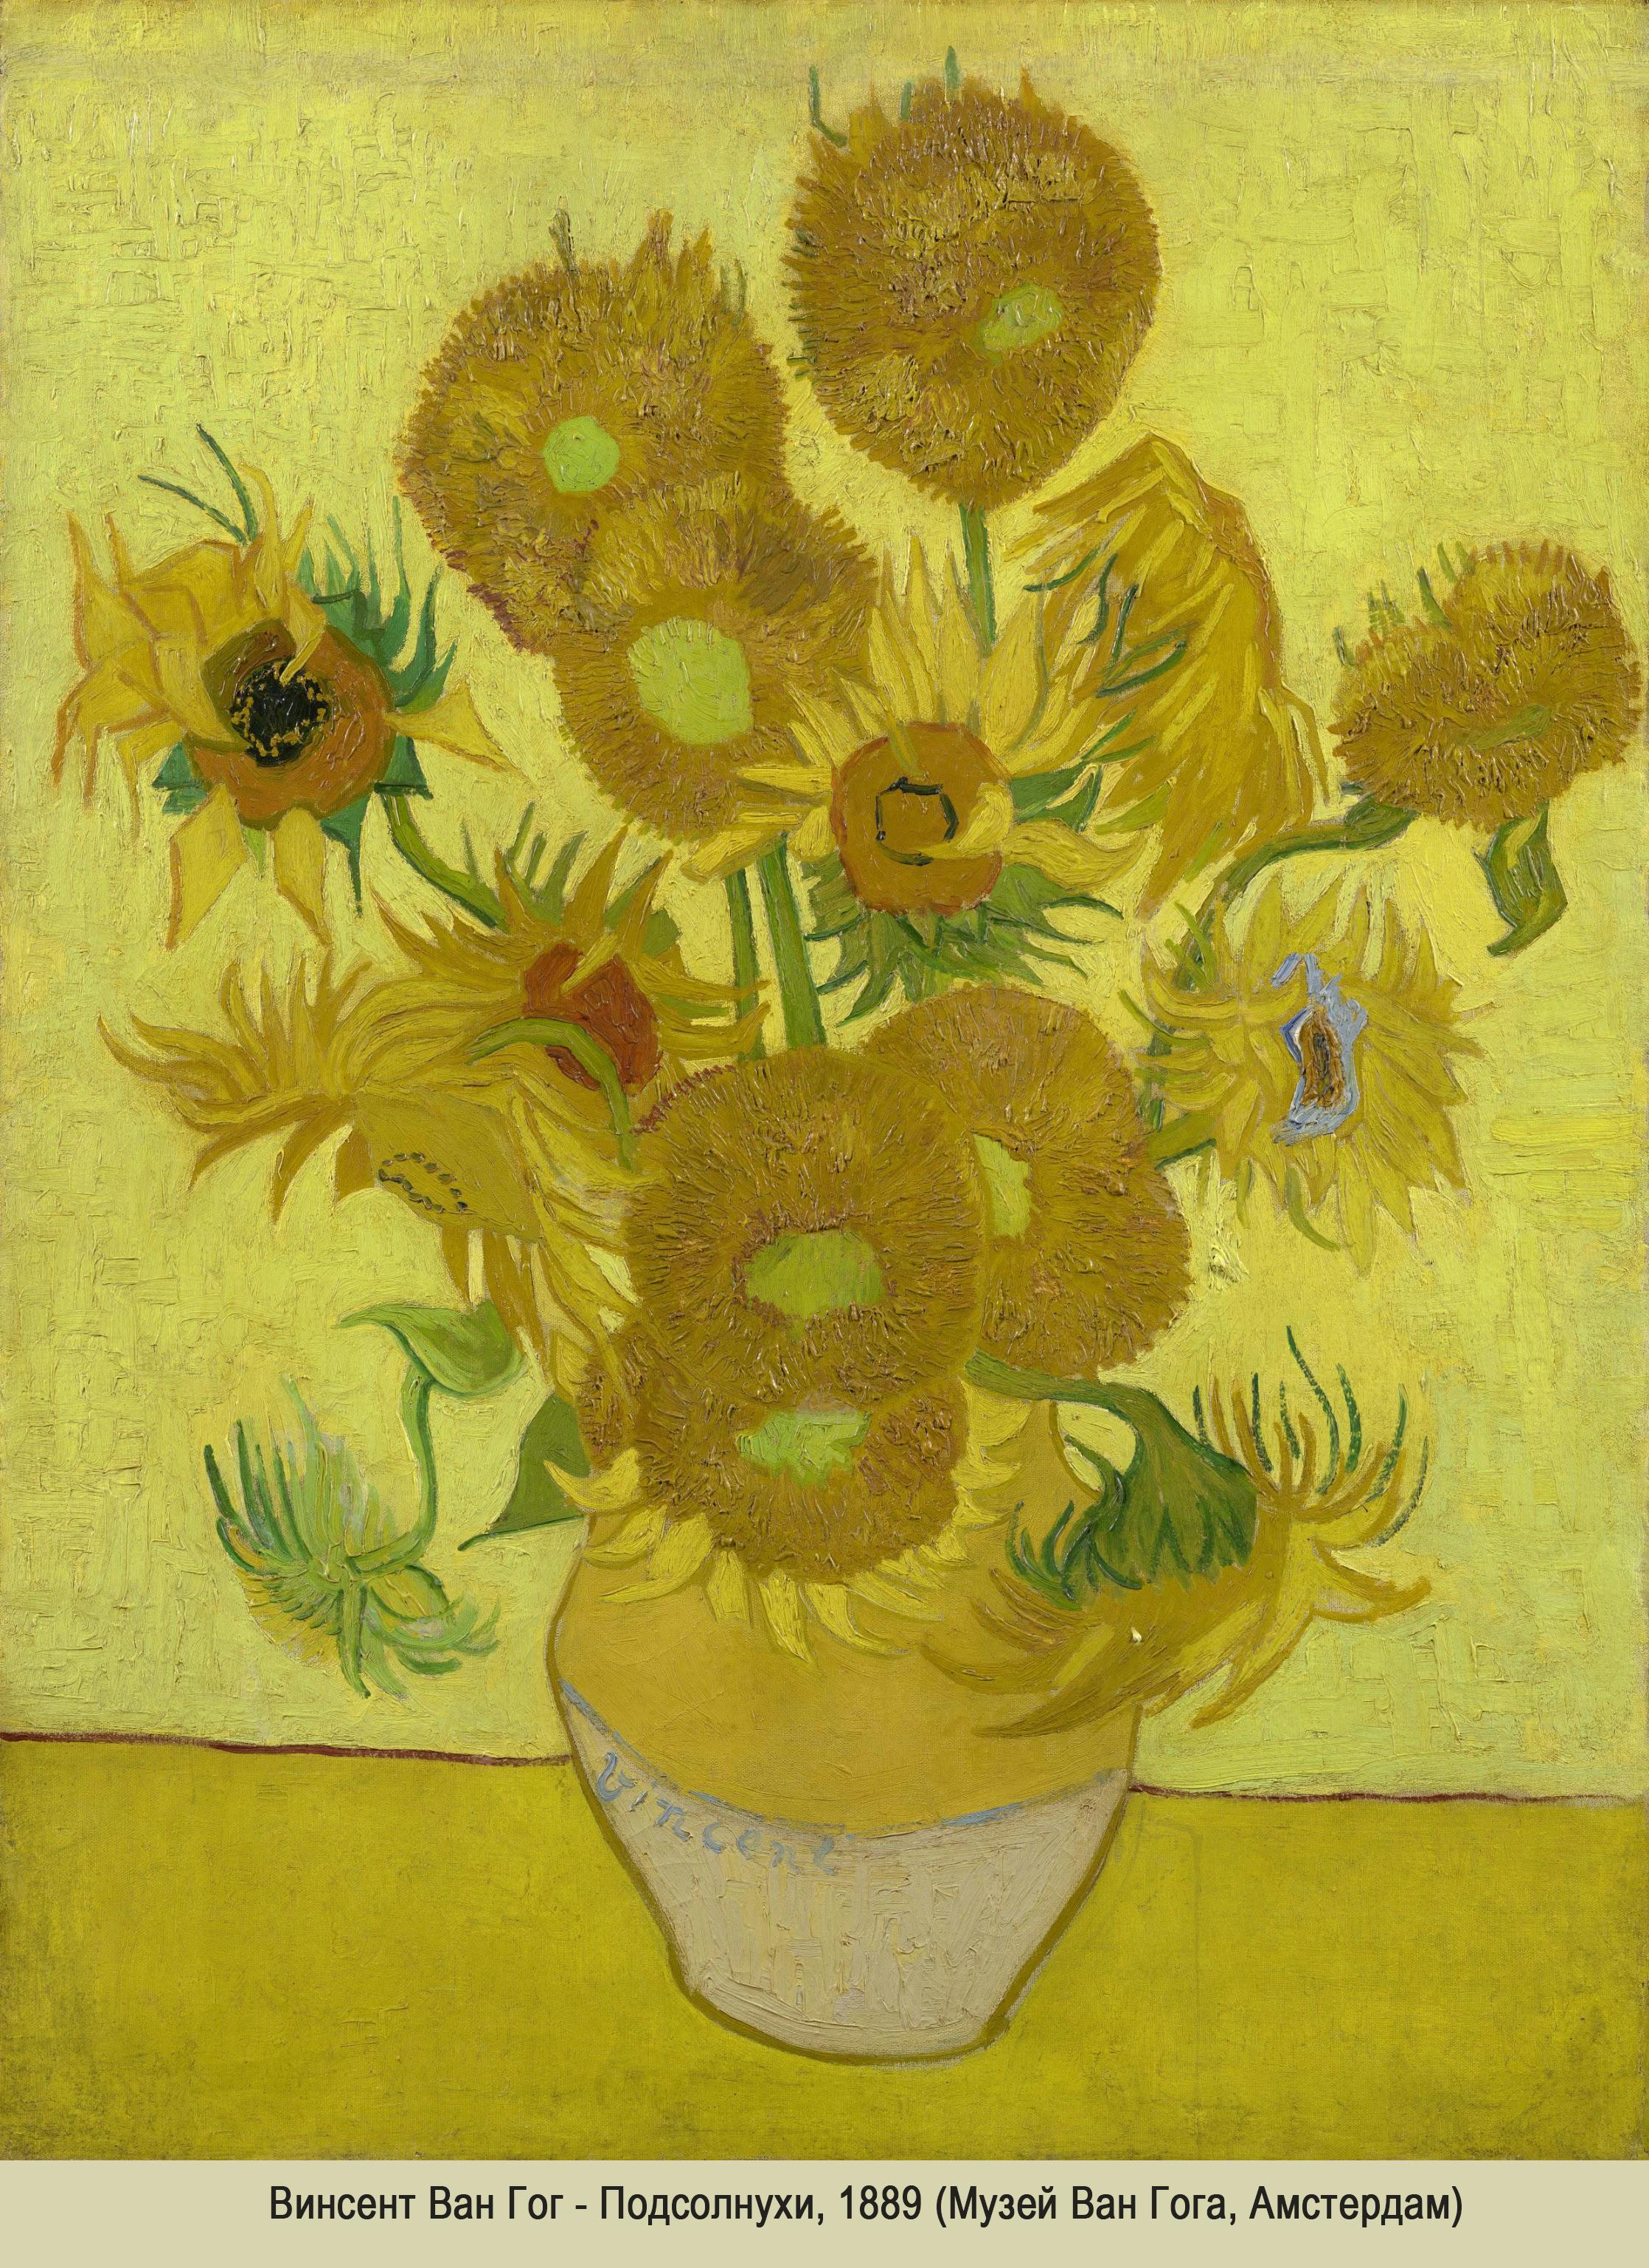 Van Gogh Ван Гог картина Подсолнухи Sunflowers landscape пейзажи природы Альберт Сафиуллин